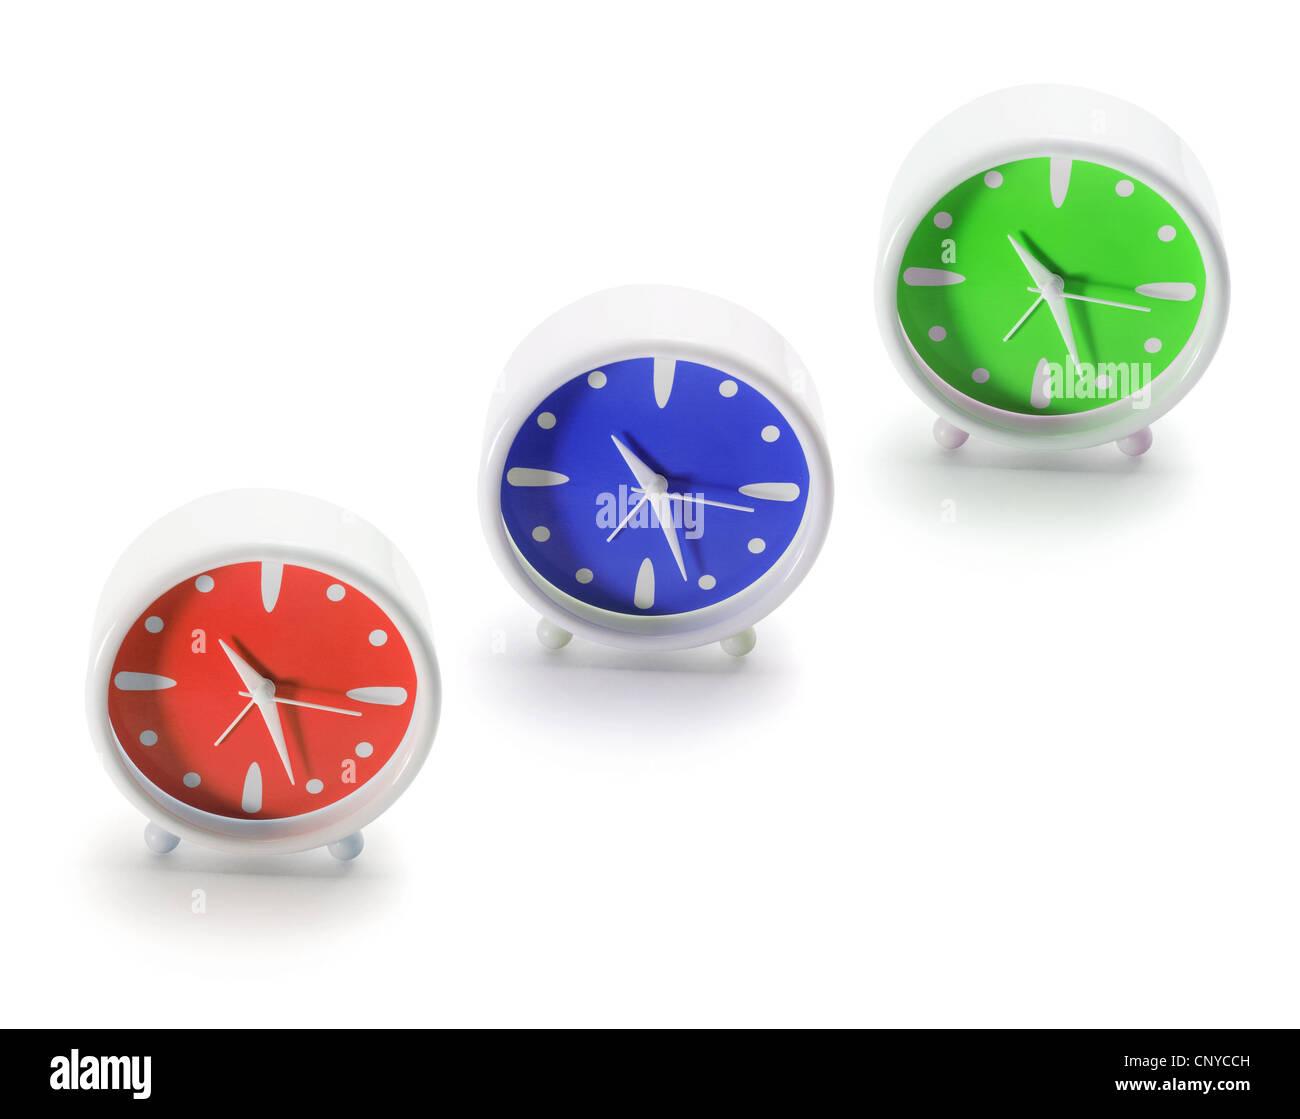 Alarm Clocks - Stock Image